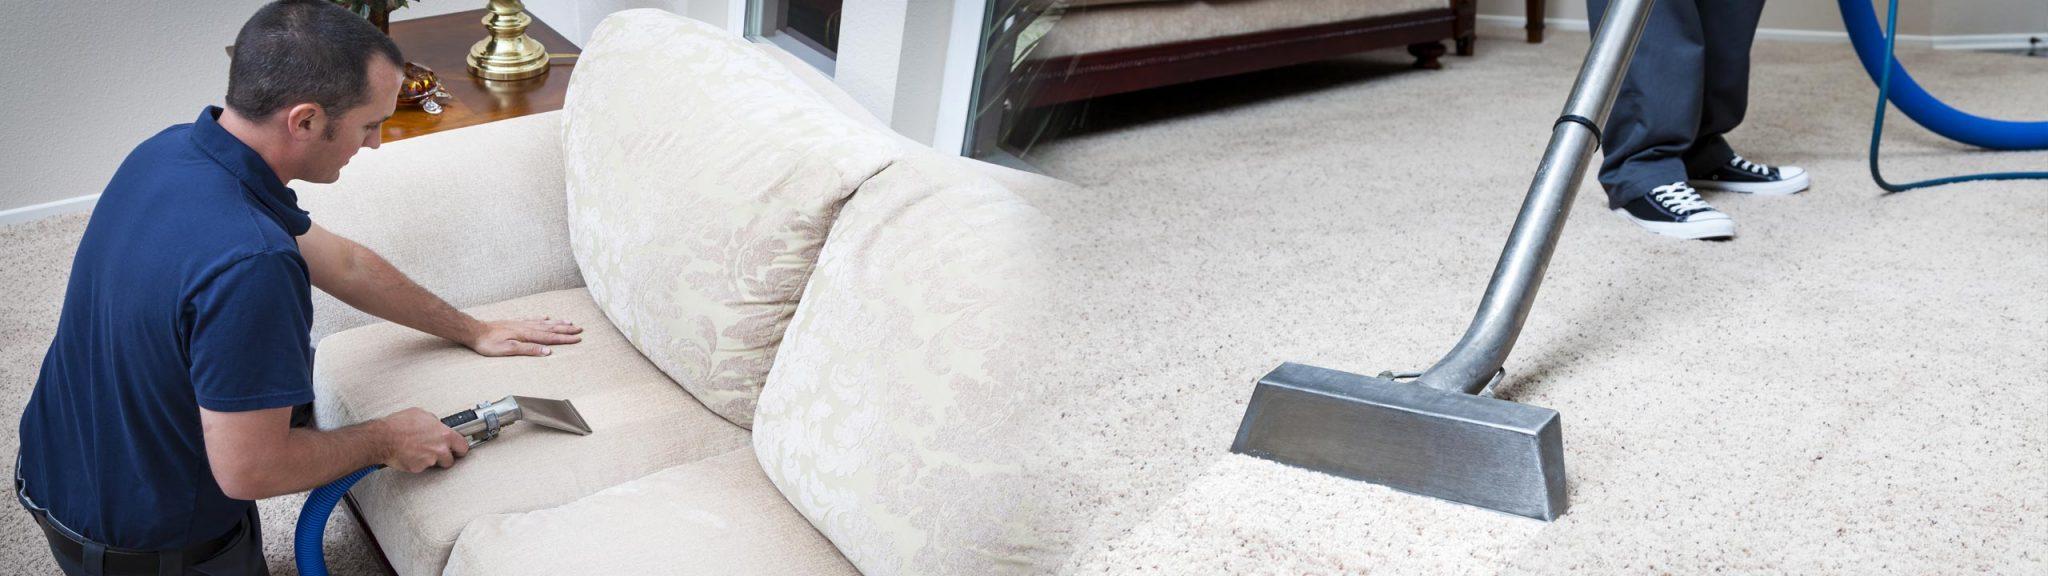 carpet cleaners croydon - the best team